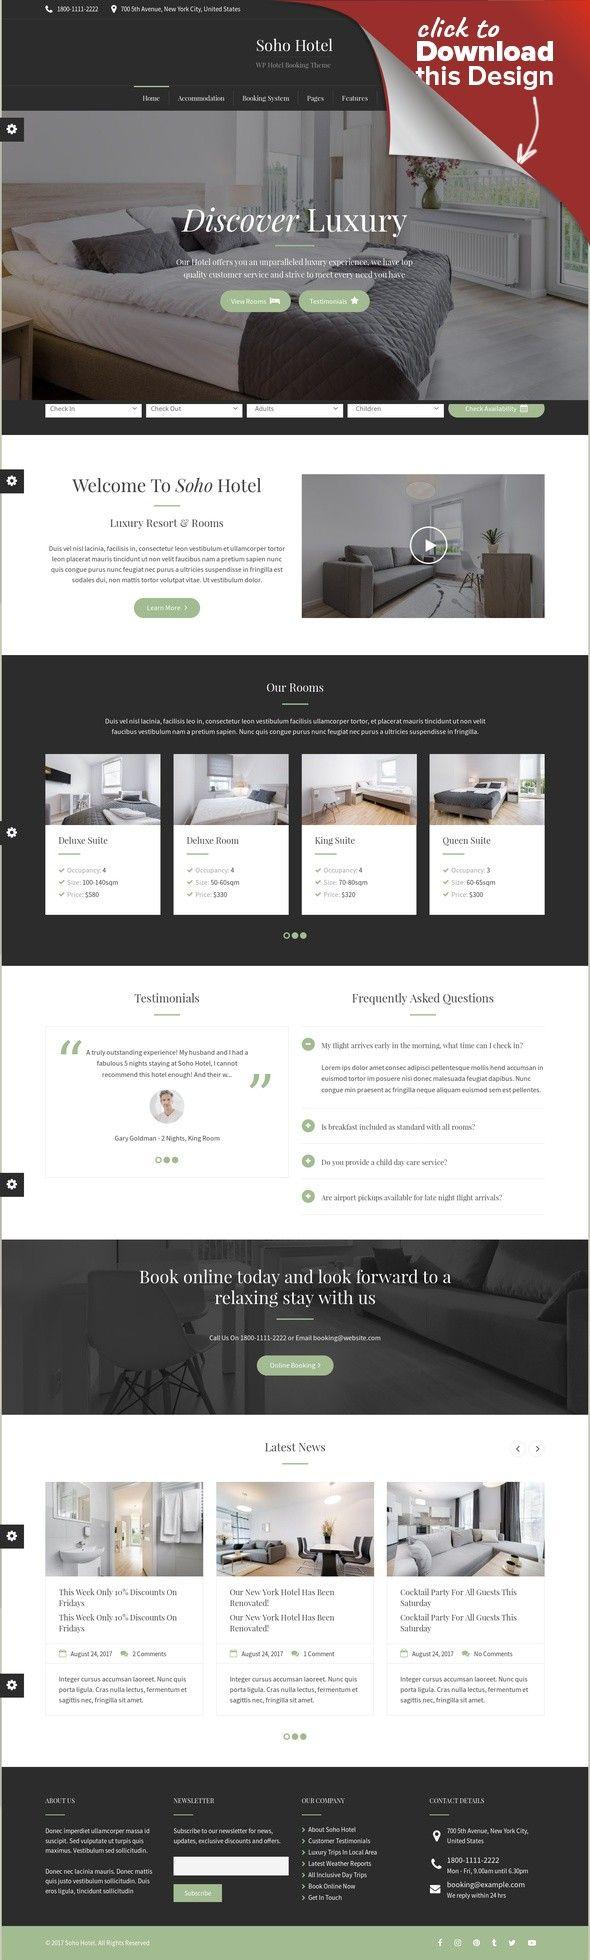 Soho Hotel - Responsive Hotel Booking WP Theme | Soho hotel, Site ...